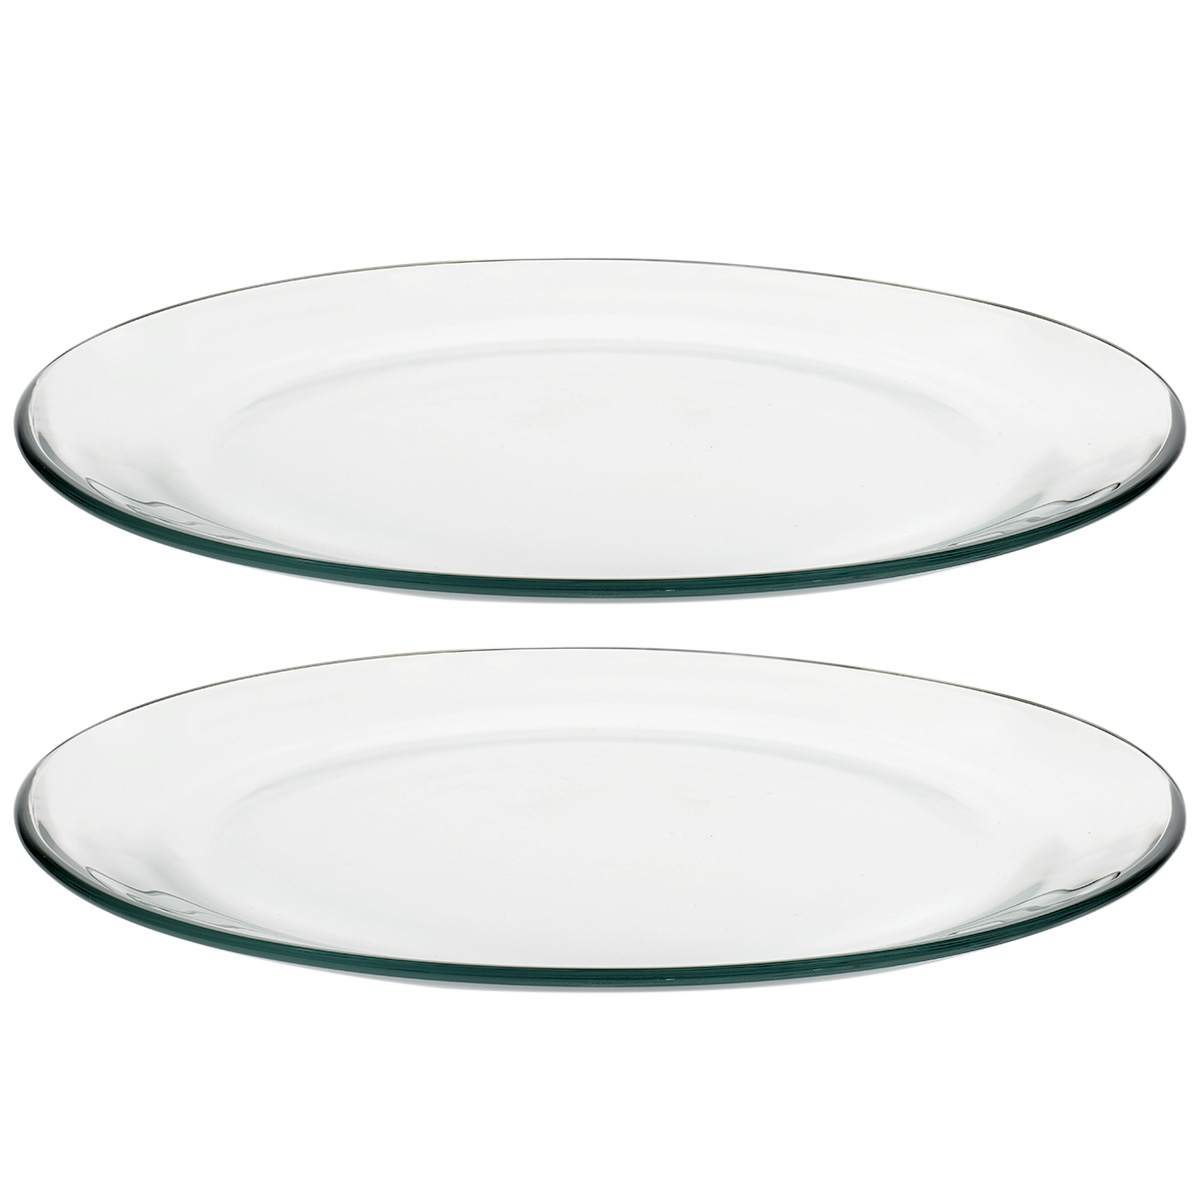 Set Platos Redondos Vidrio 22 Cm 2 Pzas Selene Cocina Libbey